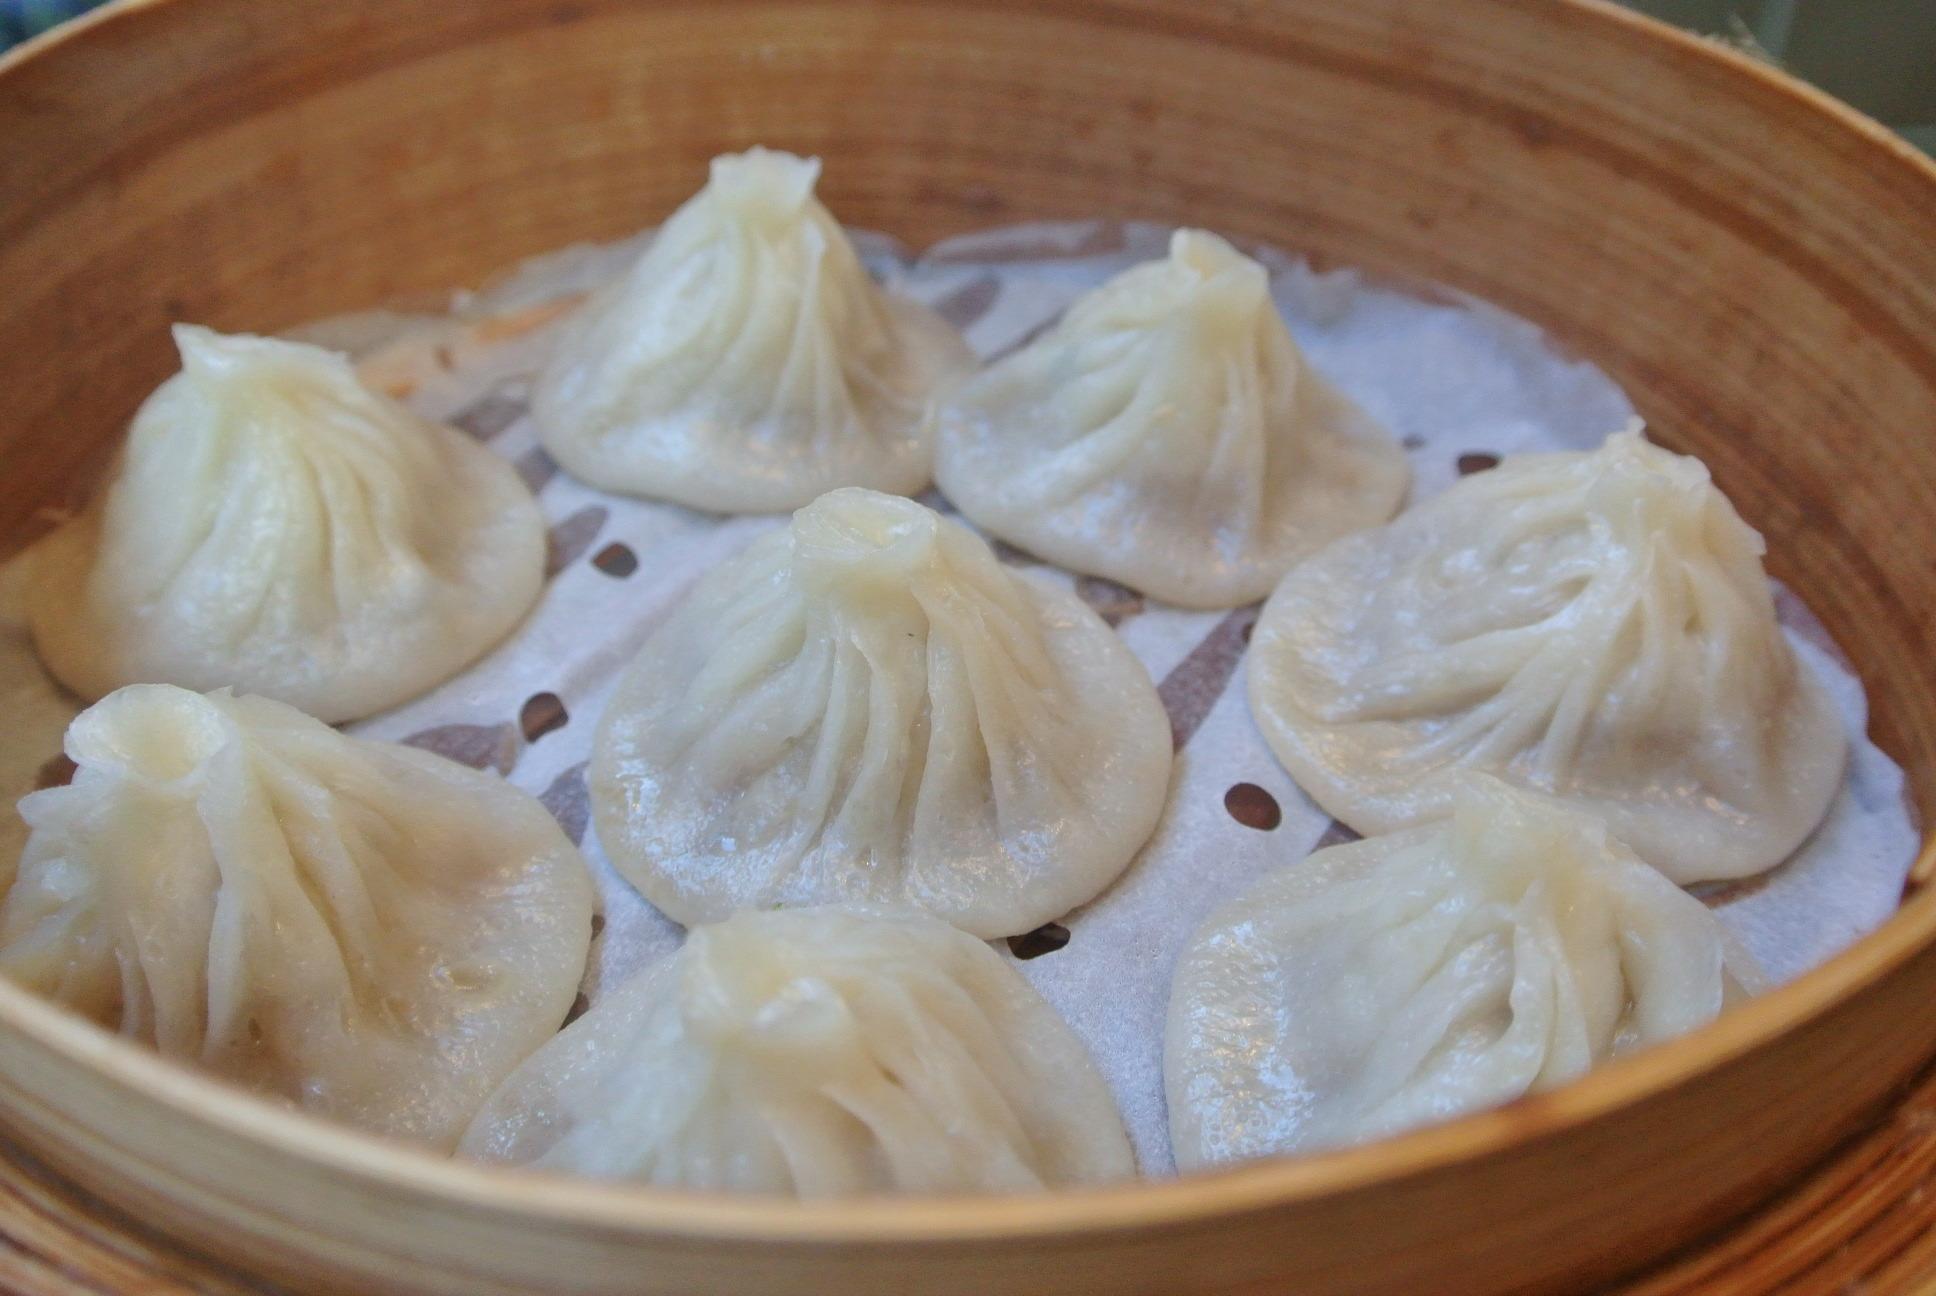 dumplings | Xi'an's Og